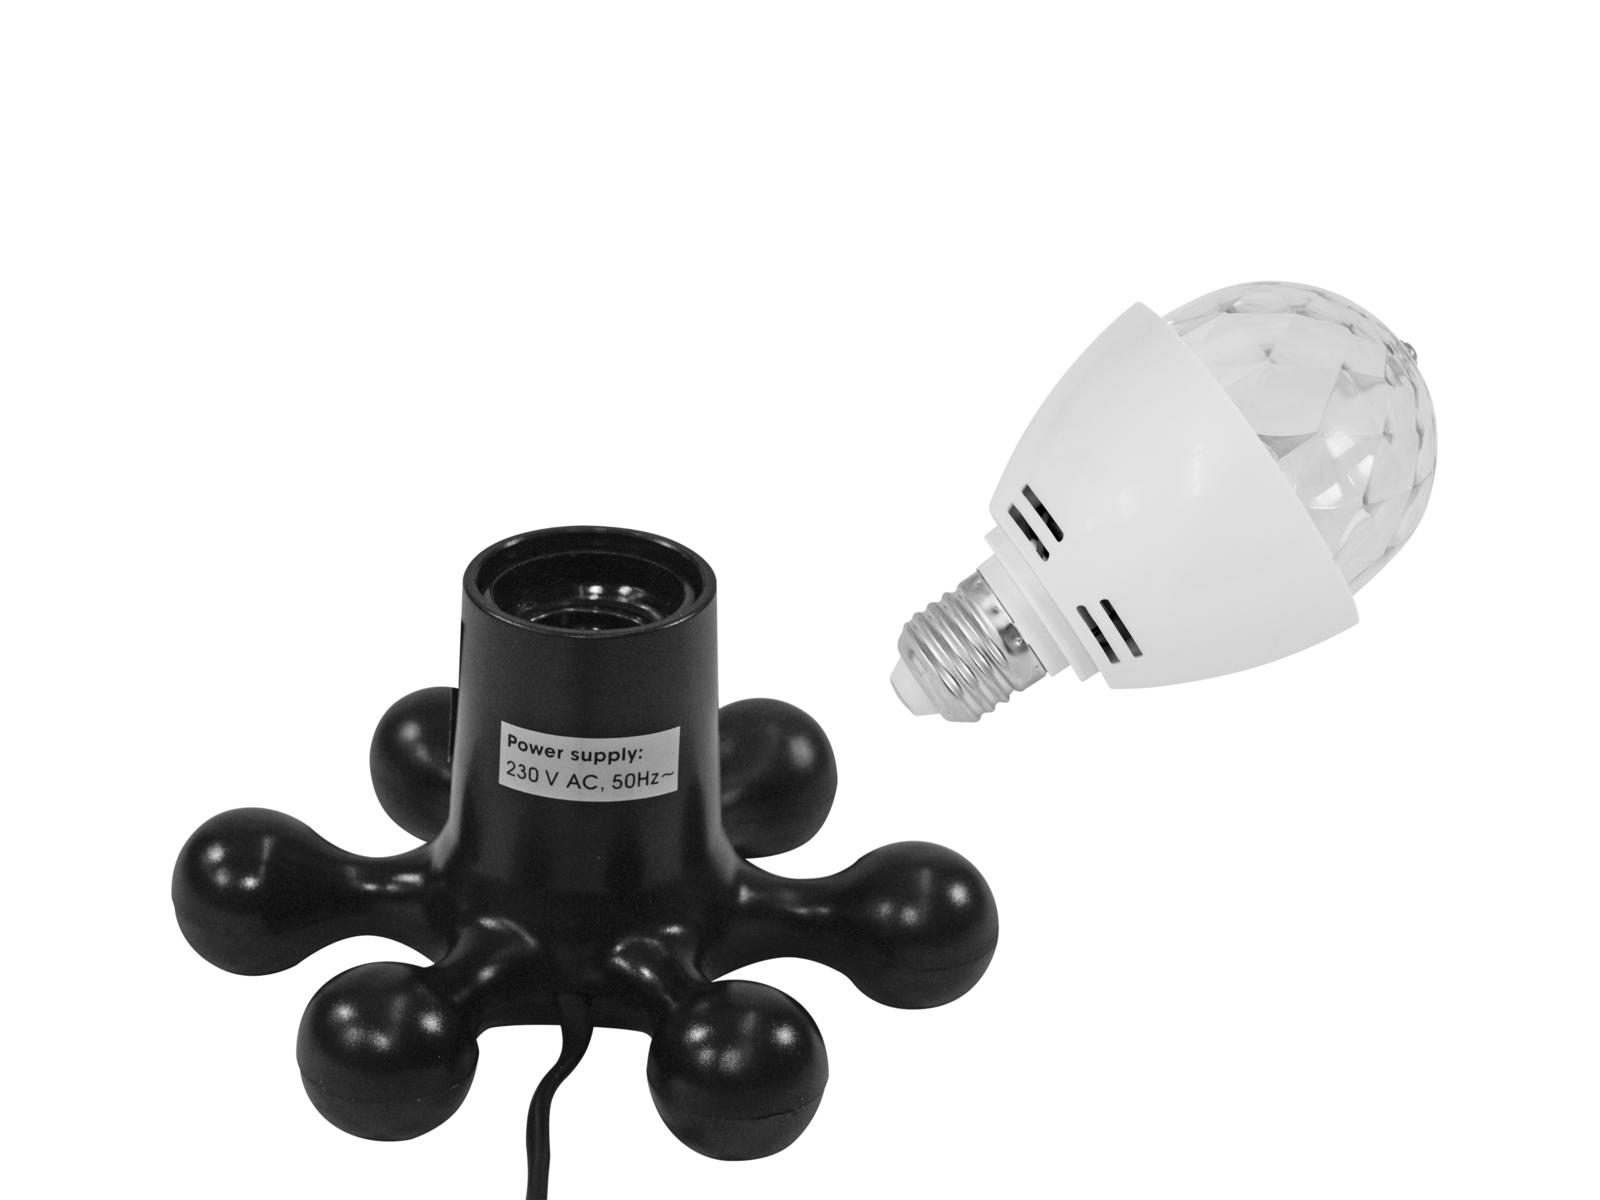 EUROLITE LED di Set BC-1 6400K + Hexopus base nera